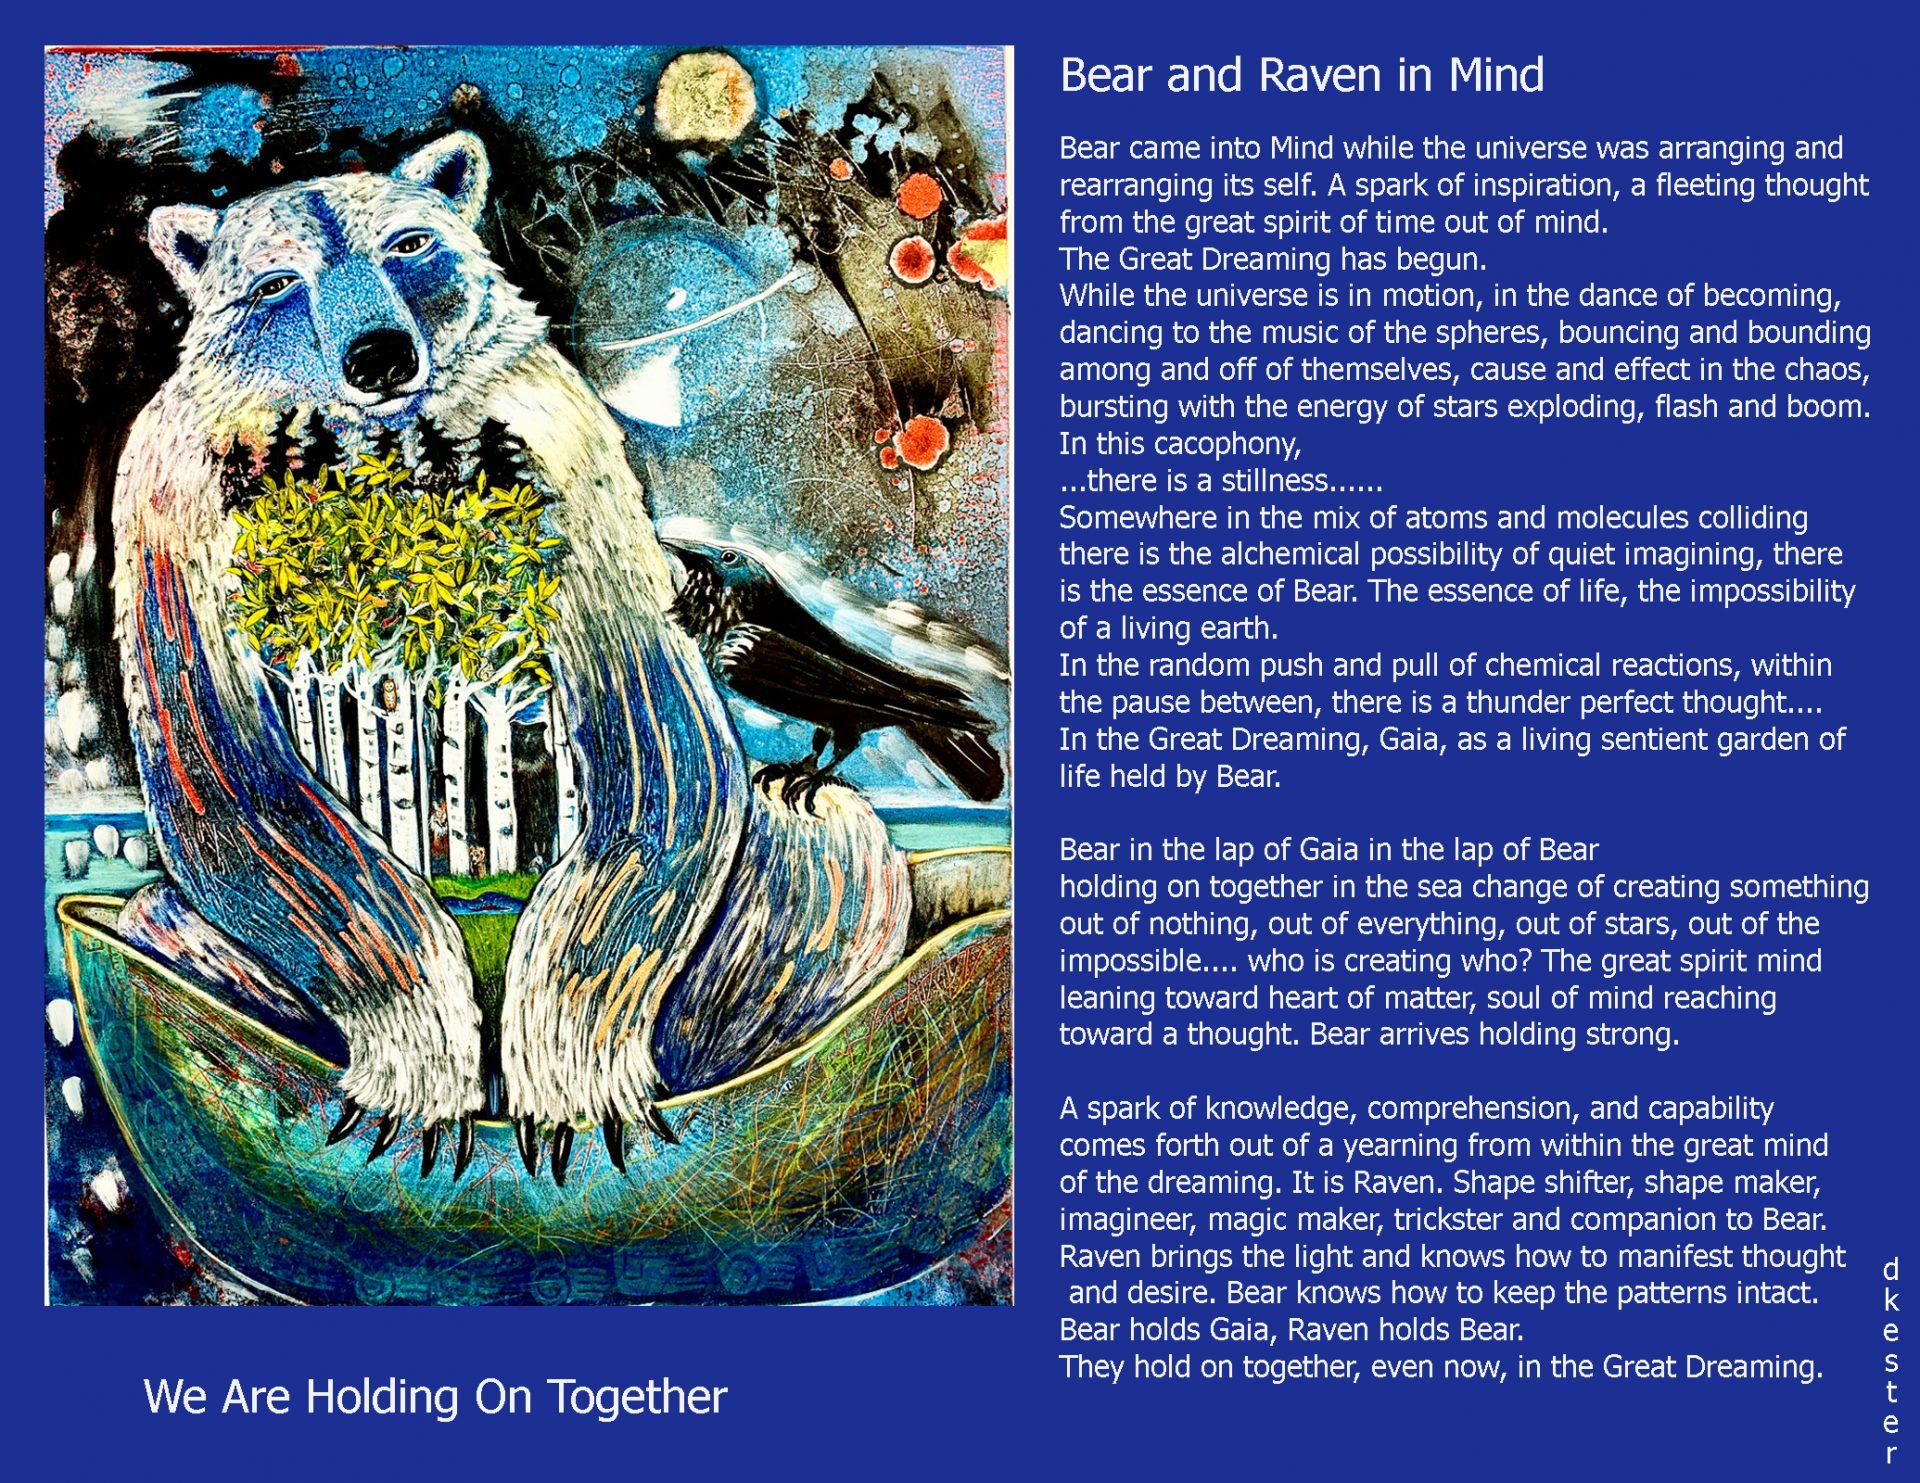 Denise Kester: Bear and Raven in Mind